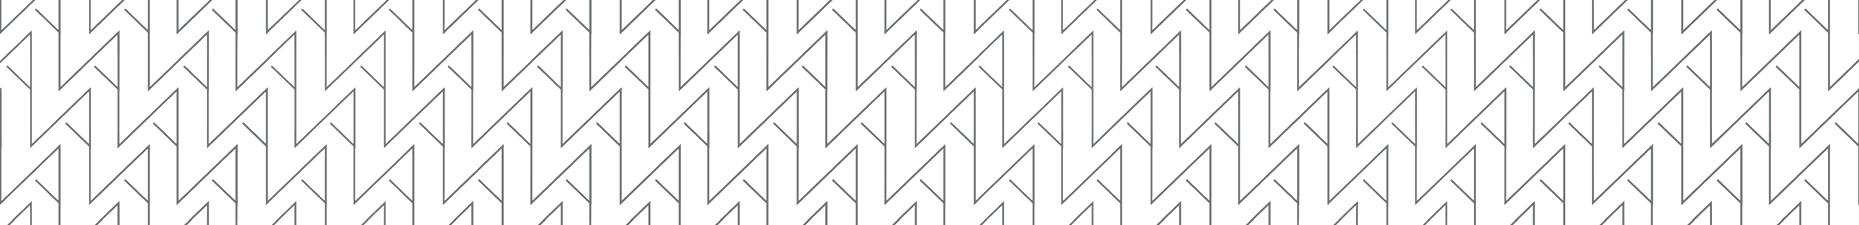 white-pattern_03.png